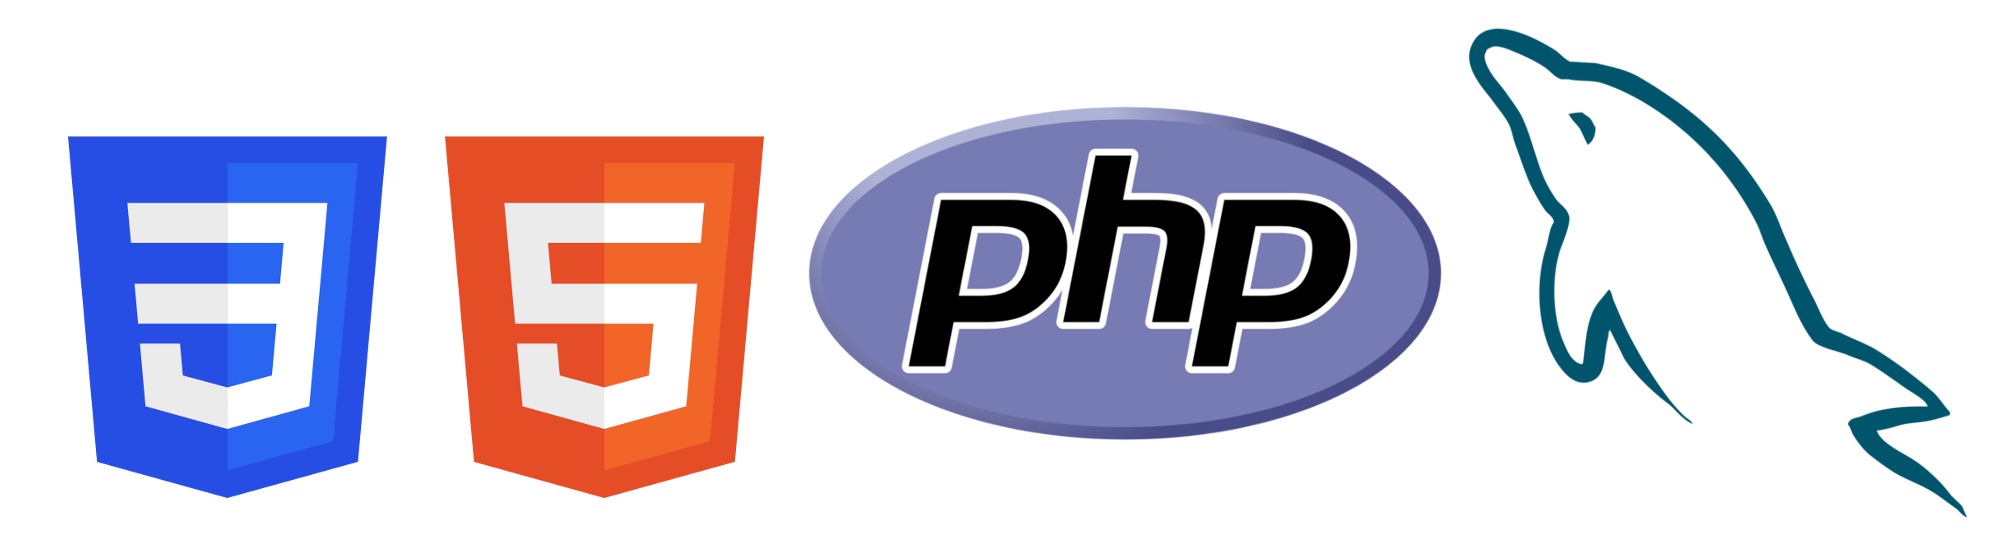 1499794875html-css-php-mysql-logo-png-transparent